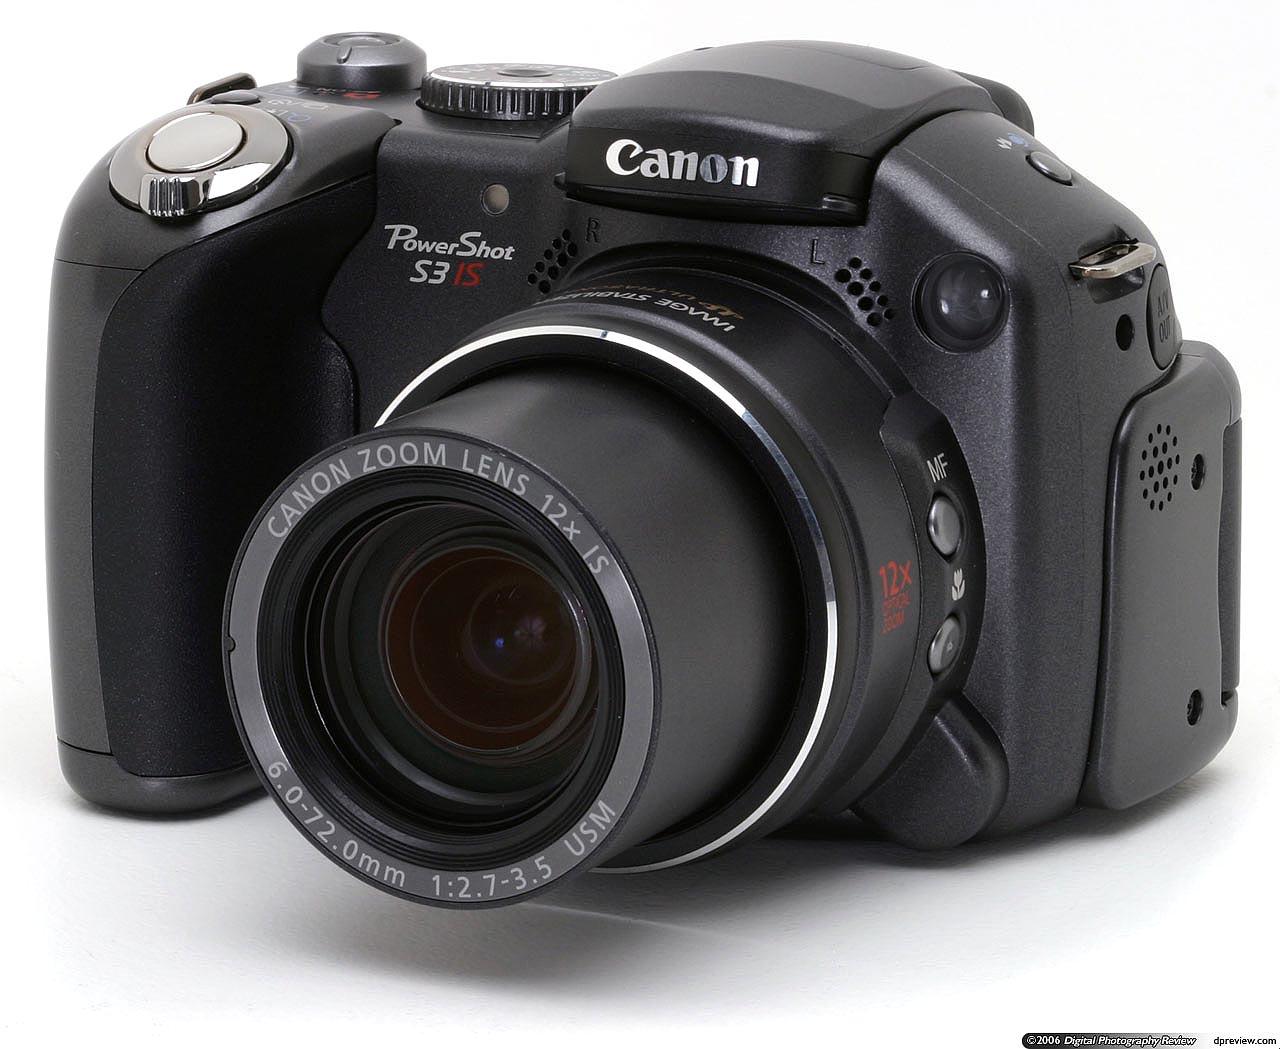 Canon PowerShot S3 IS ...